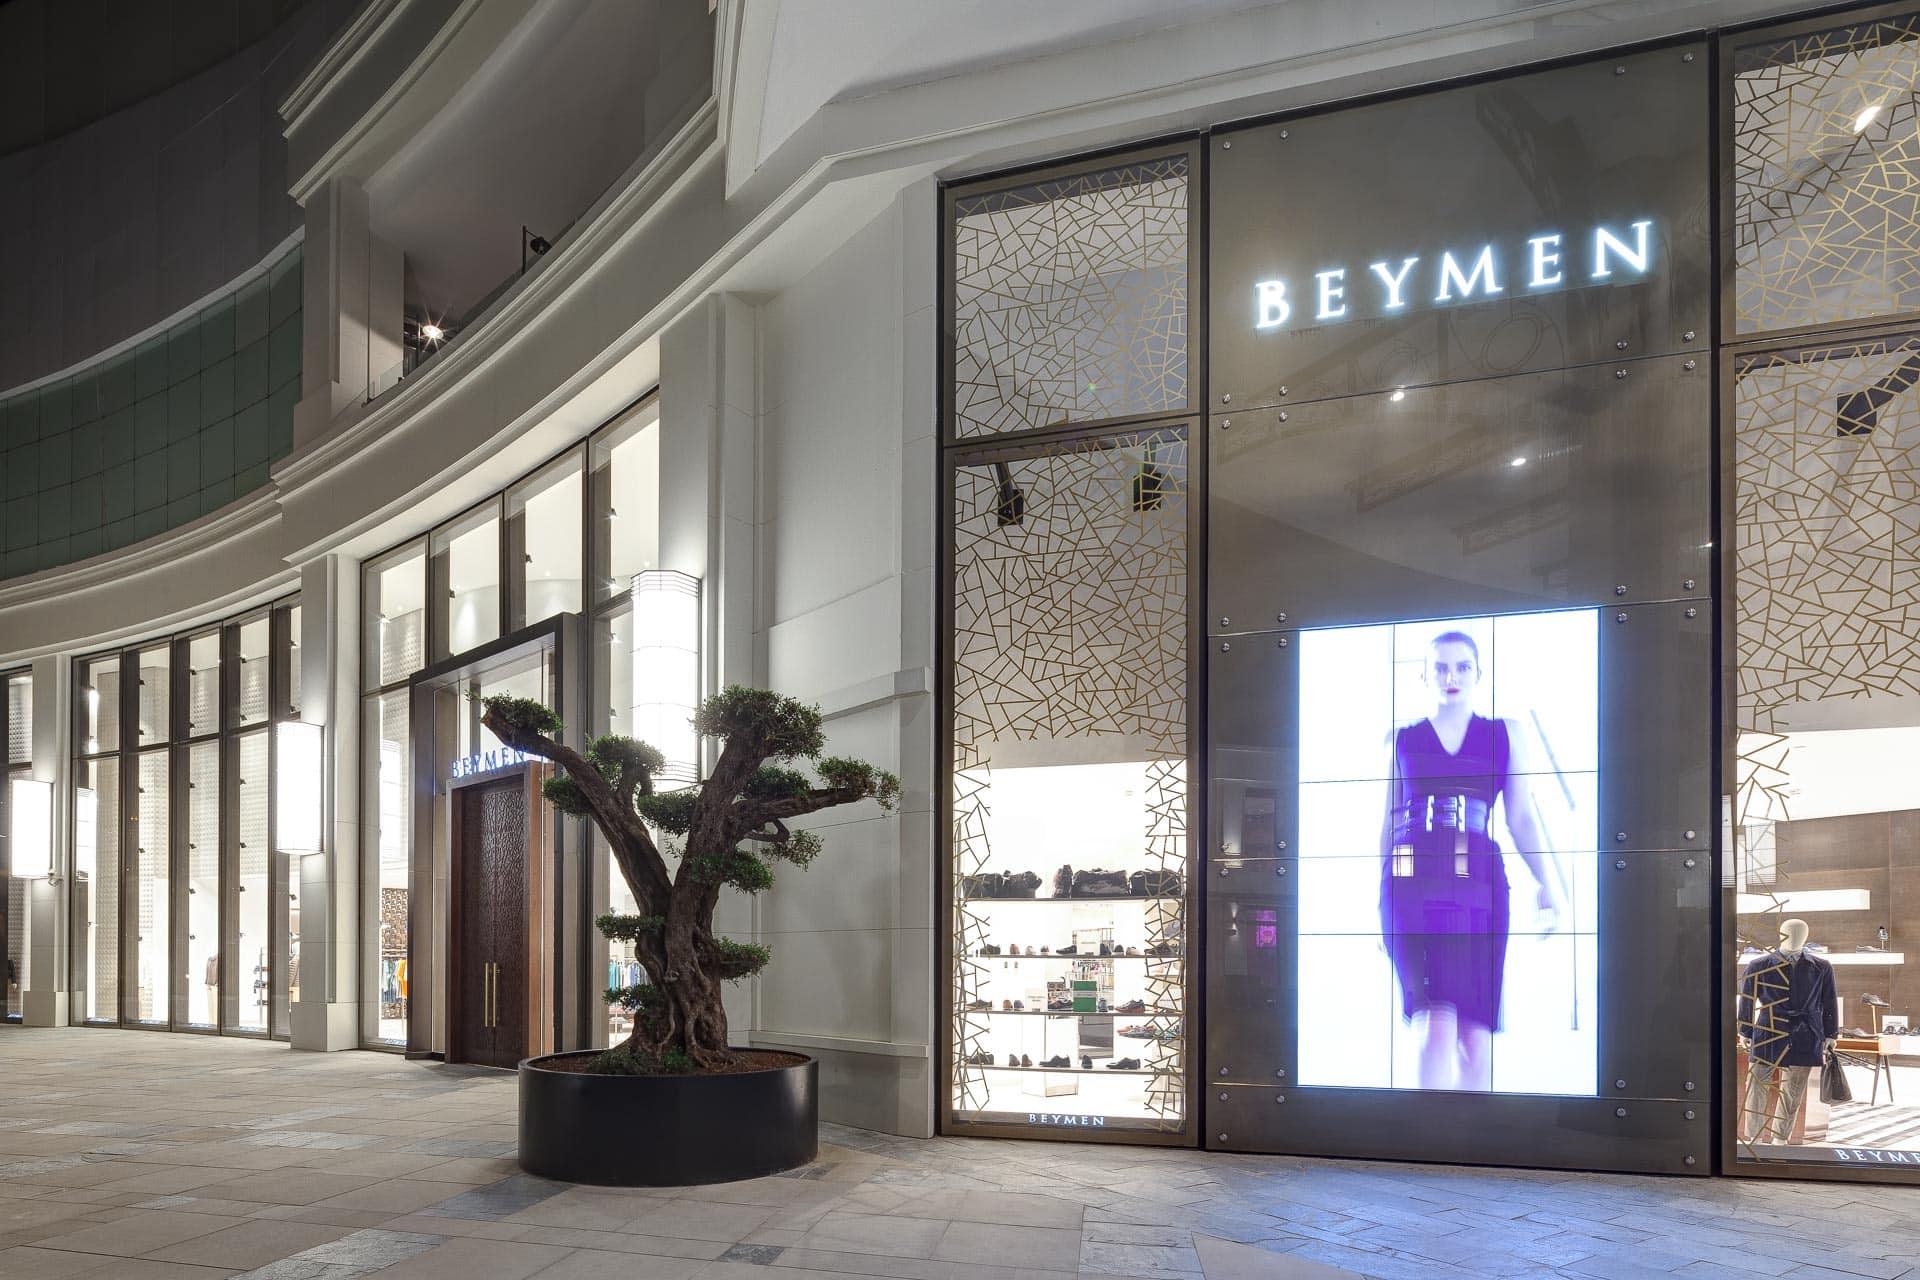 Beymen Istanbul